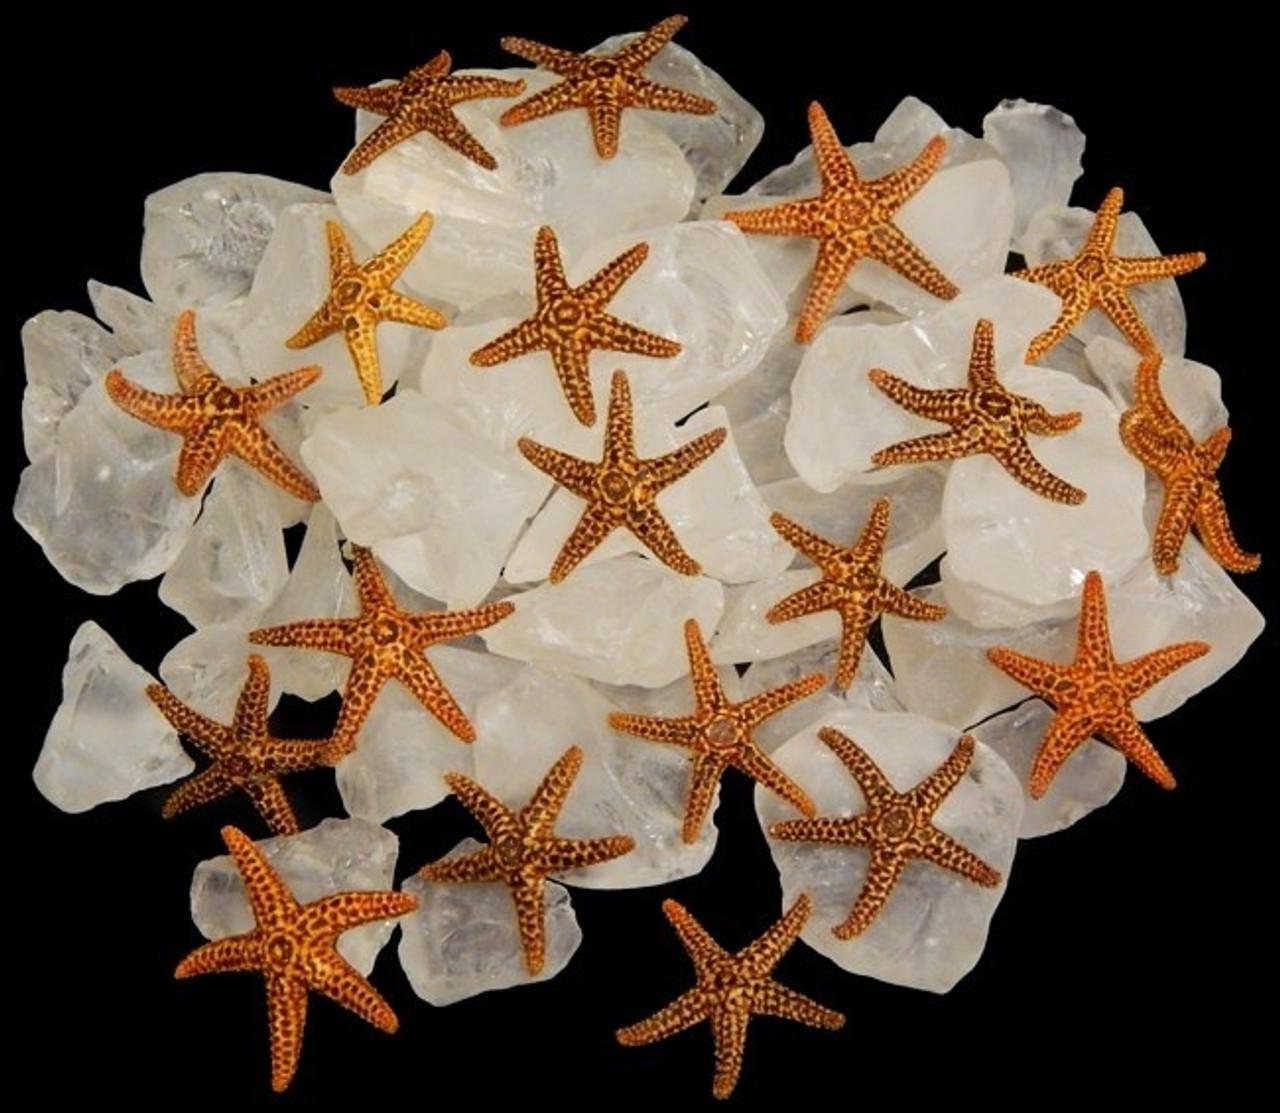 "Tiny Brown Star. 1/4"". Set of 50"